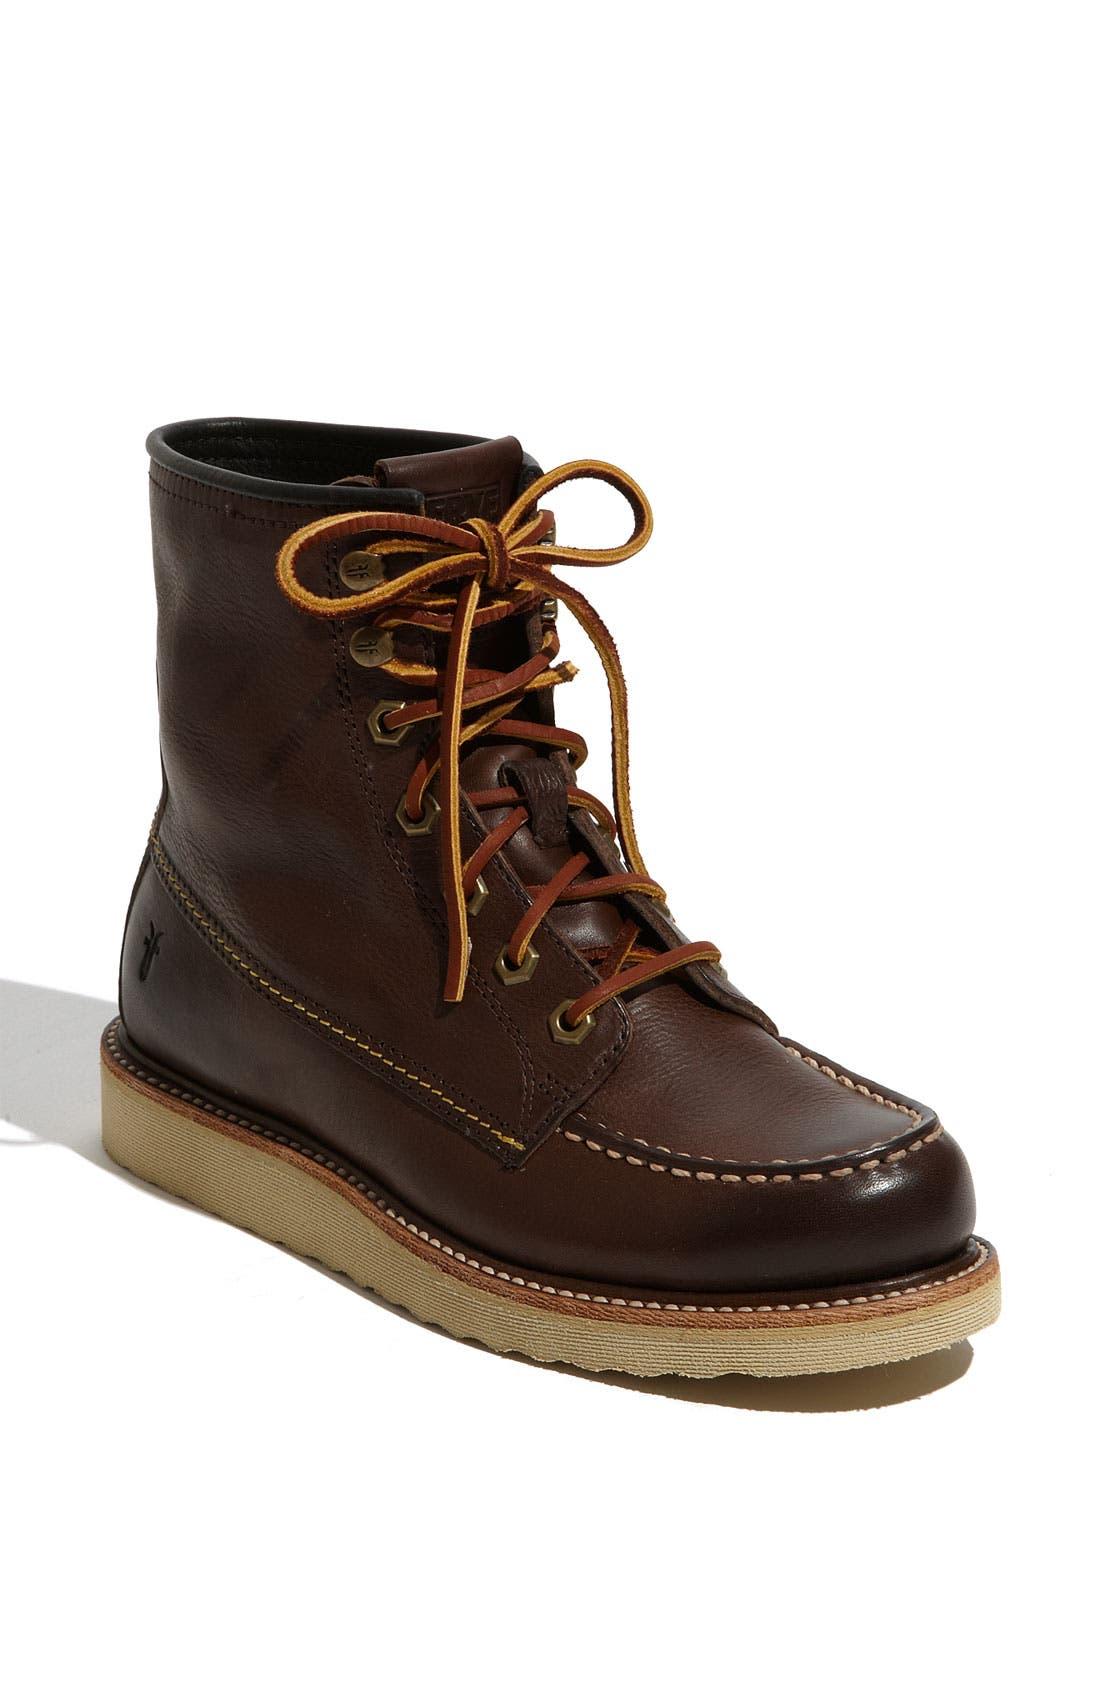 Alternate Image 1 Selected - Frye 'Dakota' Wedge Boot